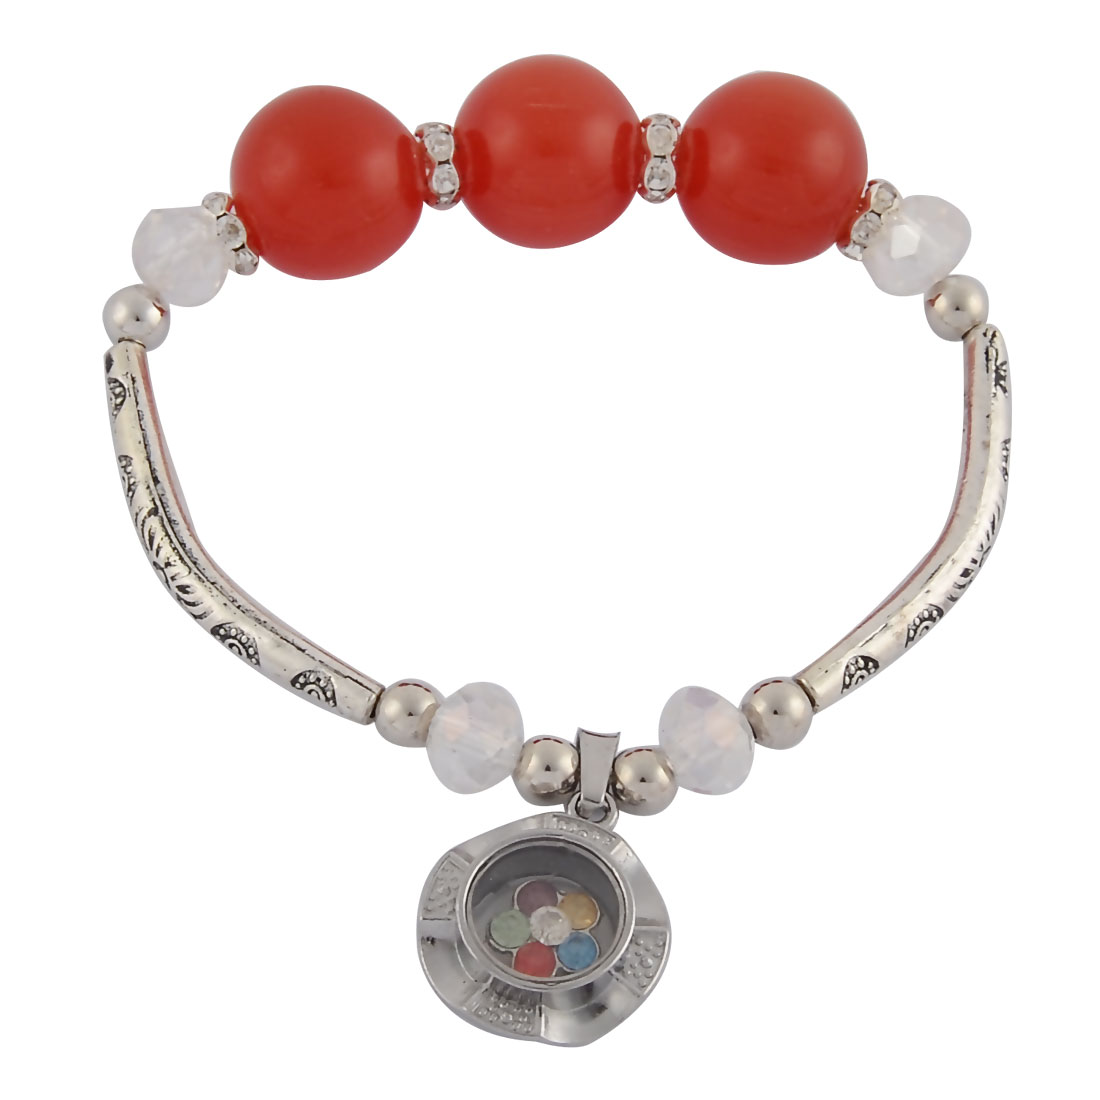 Women Rhinestone Inlaid Pendant Elastic Bead Chain Wrist Bracelet Bangle Brick Red